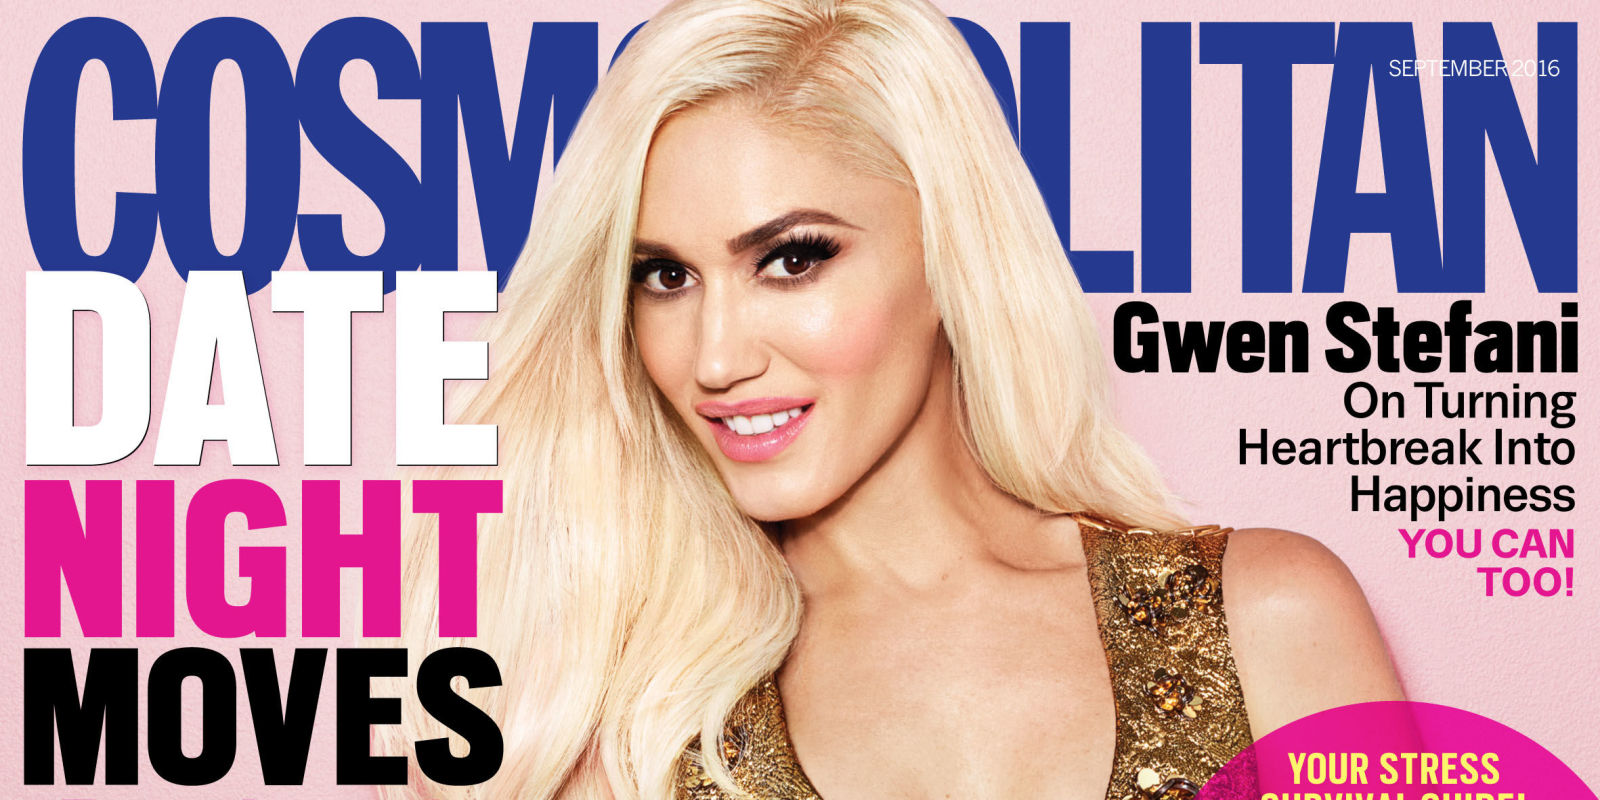 Gwen Stefani September 2016 Cosmo Cover - Gwen Stefani on Blake Shelton